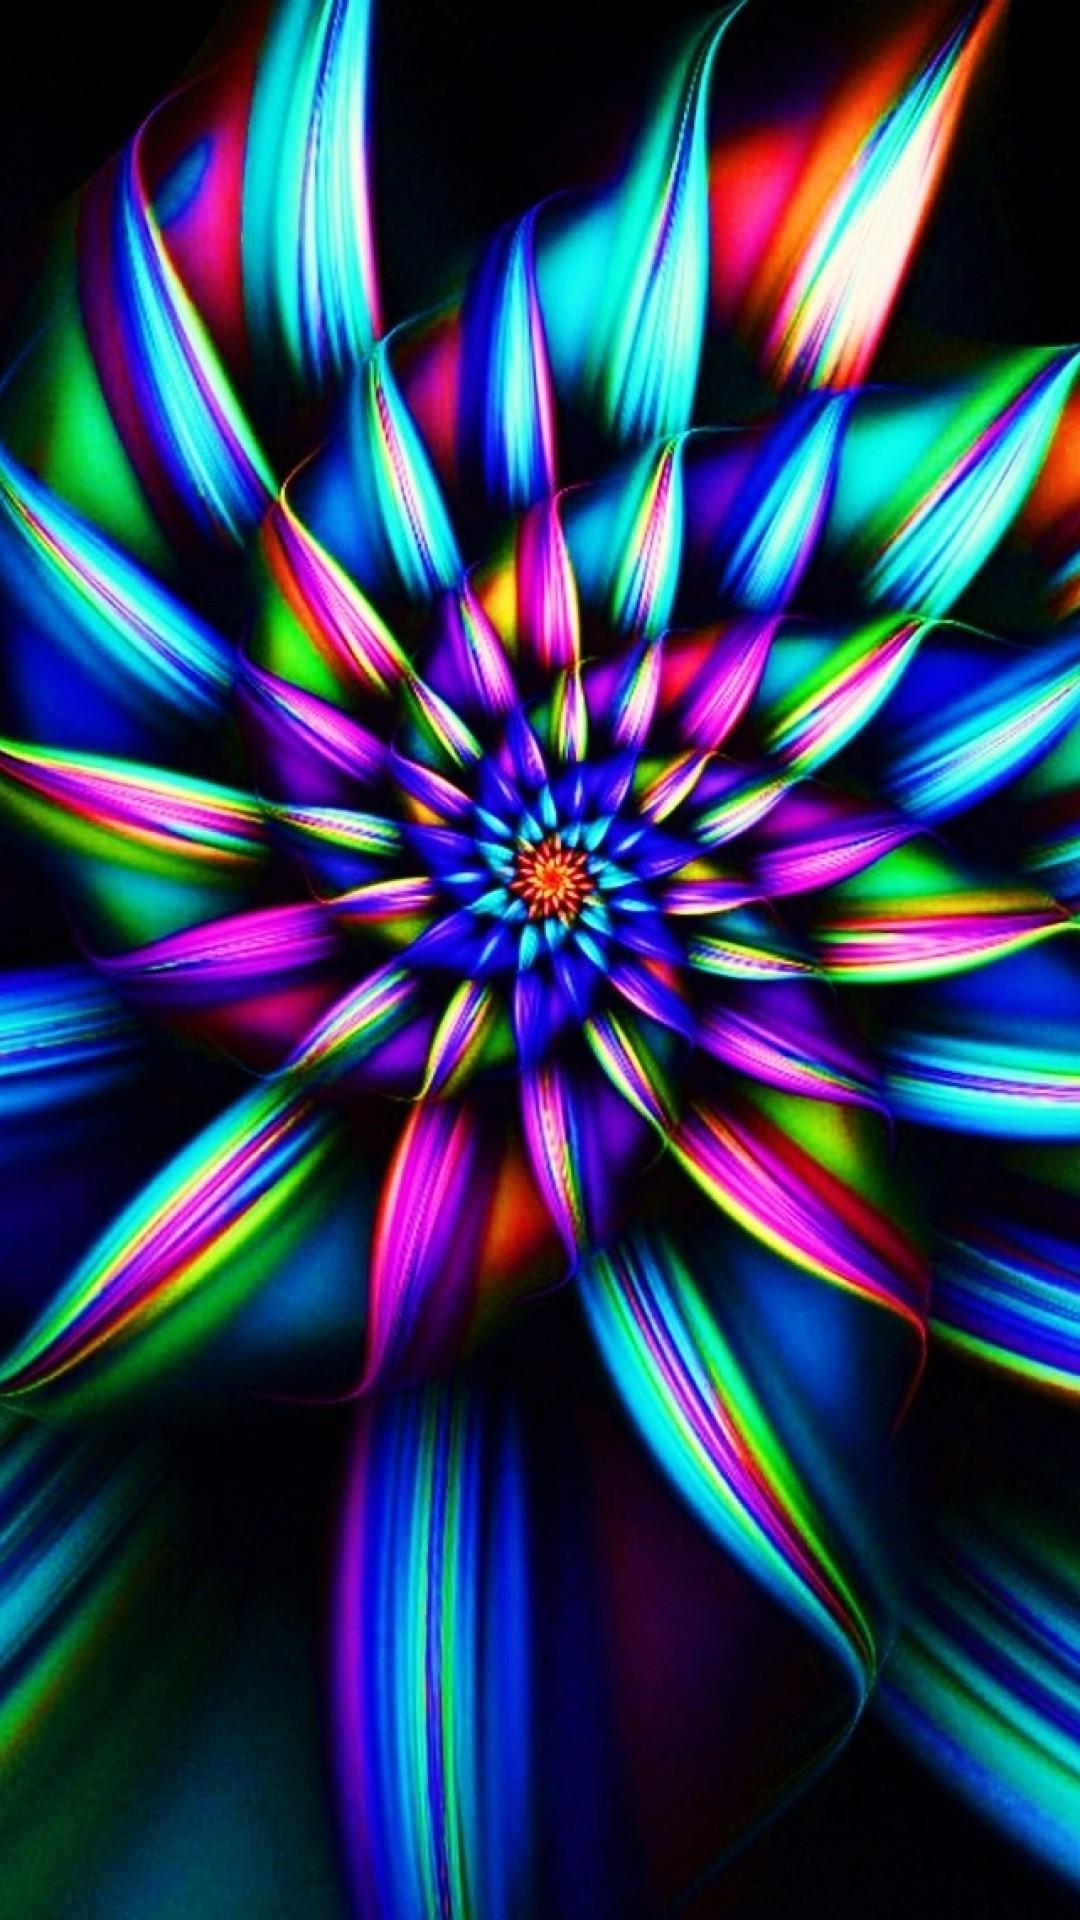 Colorful Smoke Wallpaper (70+ images)